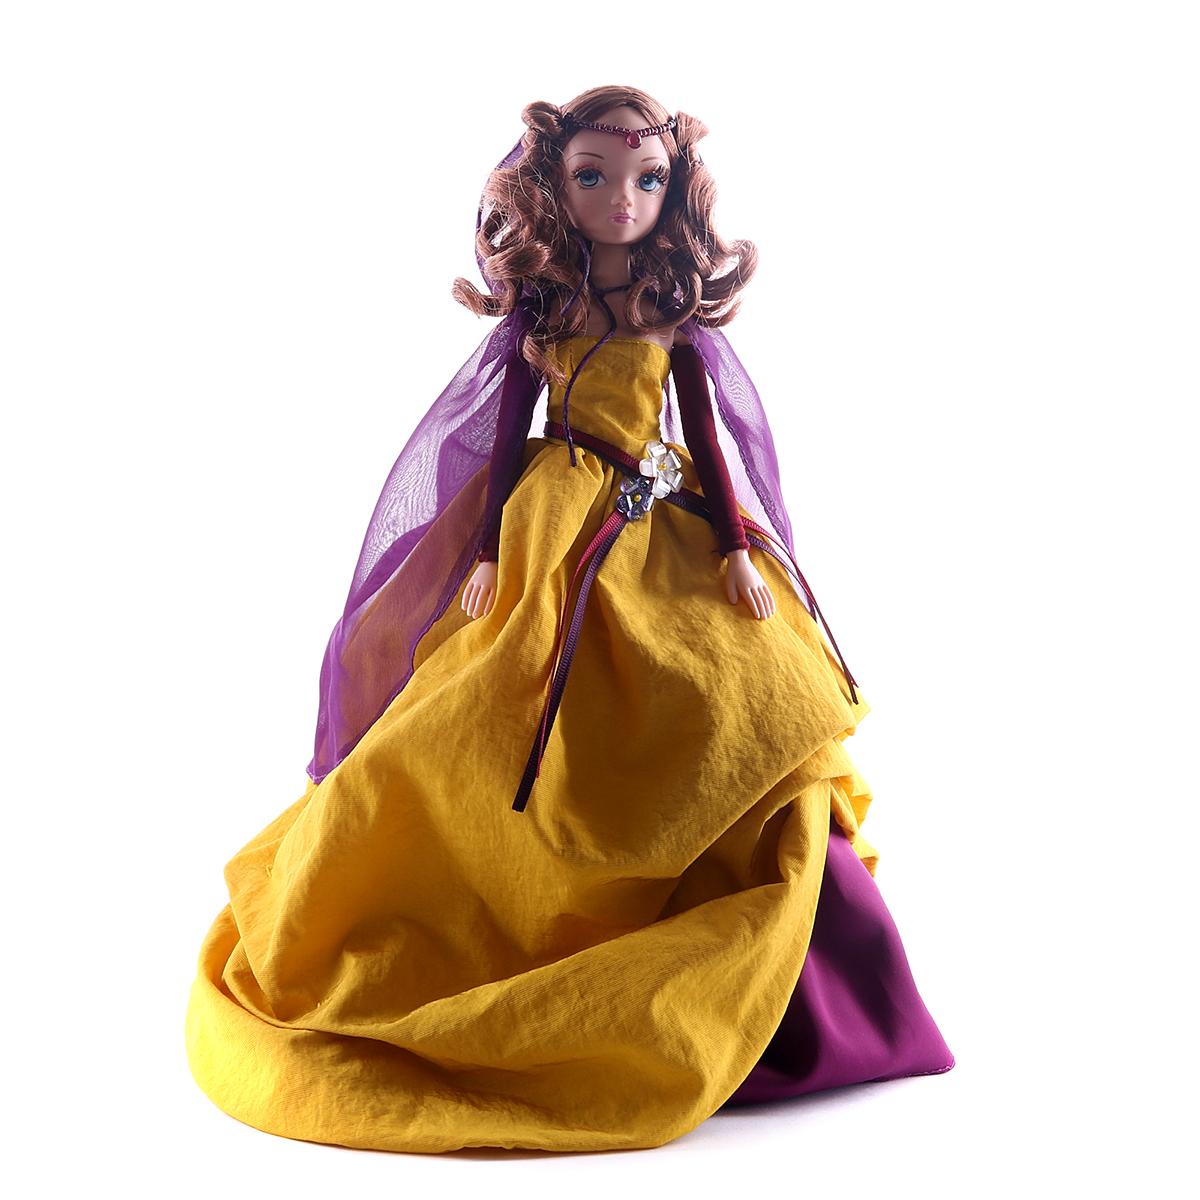 Кукла SONYA Gold collection в платье Эльза кукла sonya gold collection в платье эльза